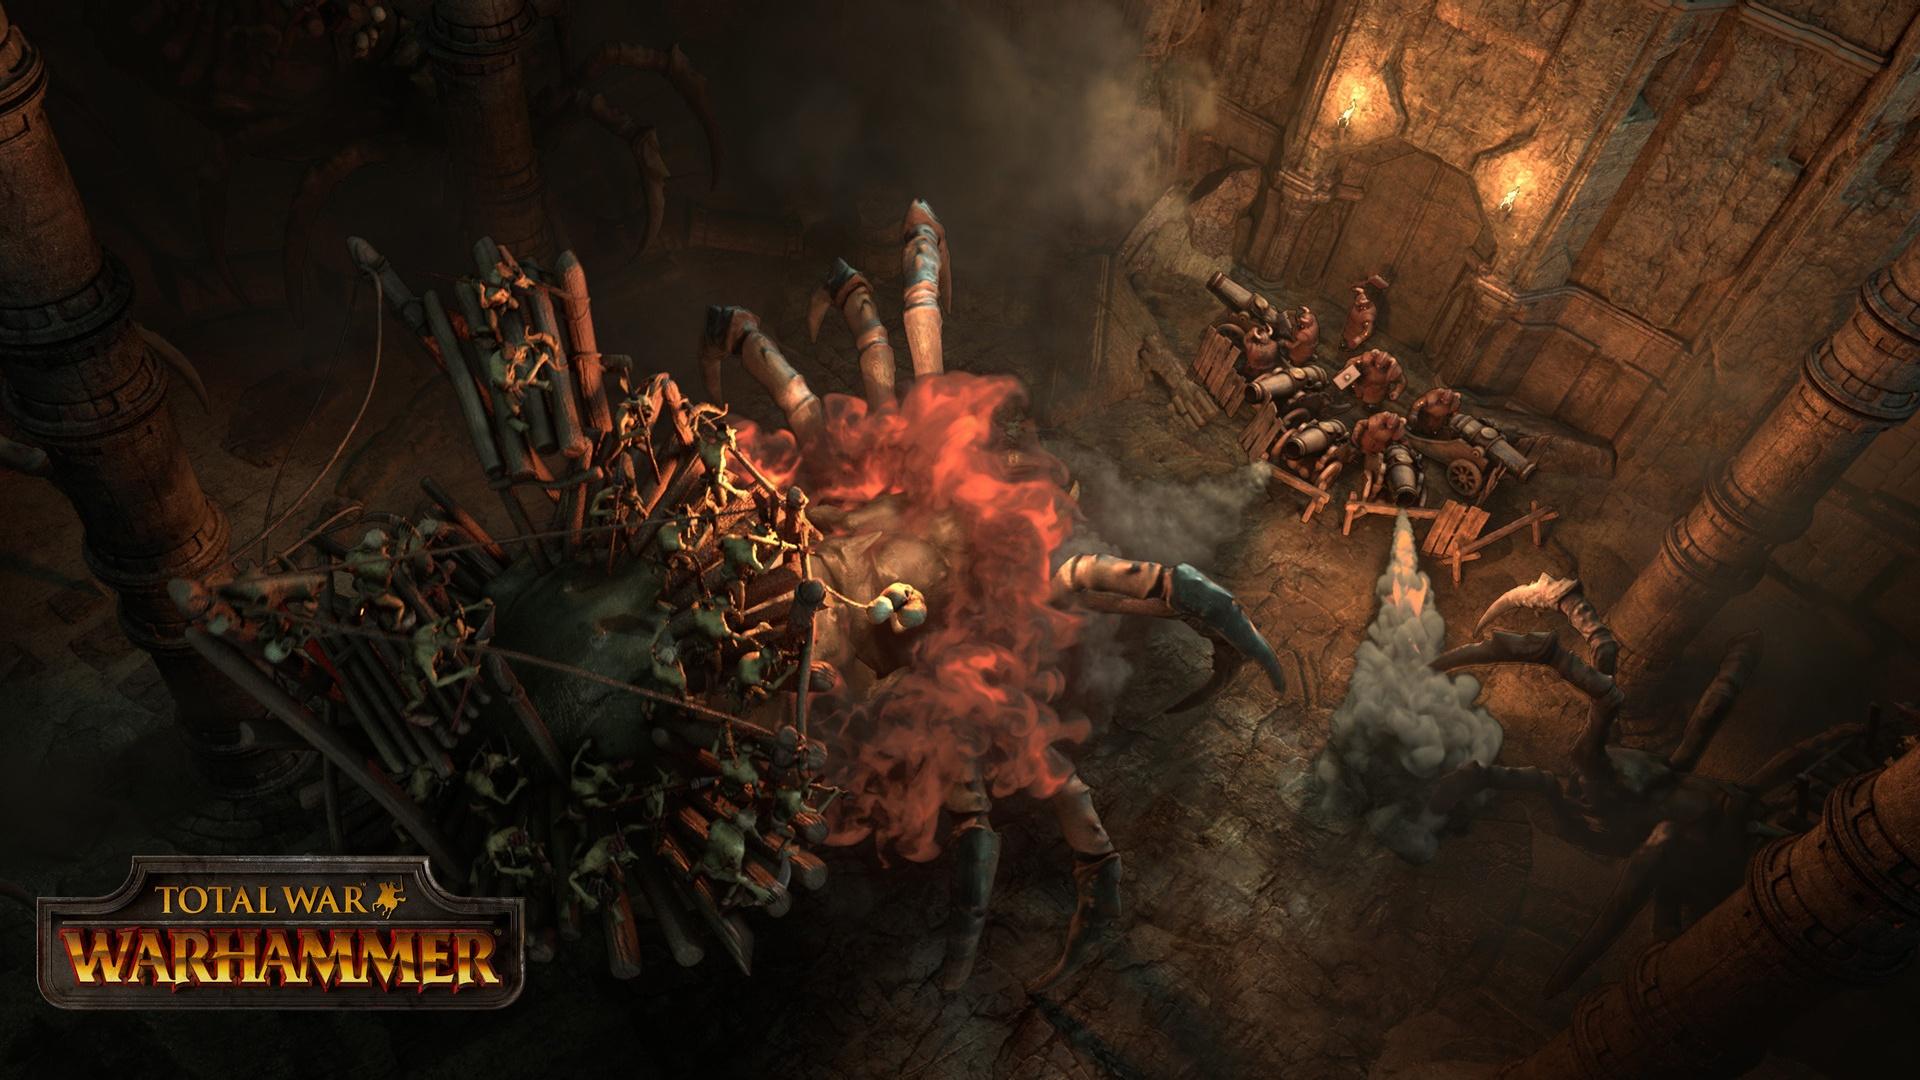 1440x900 Total War Warhammer Pc Game 1440x900 Resolution Hd 4k